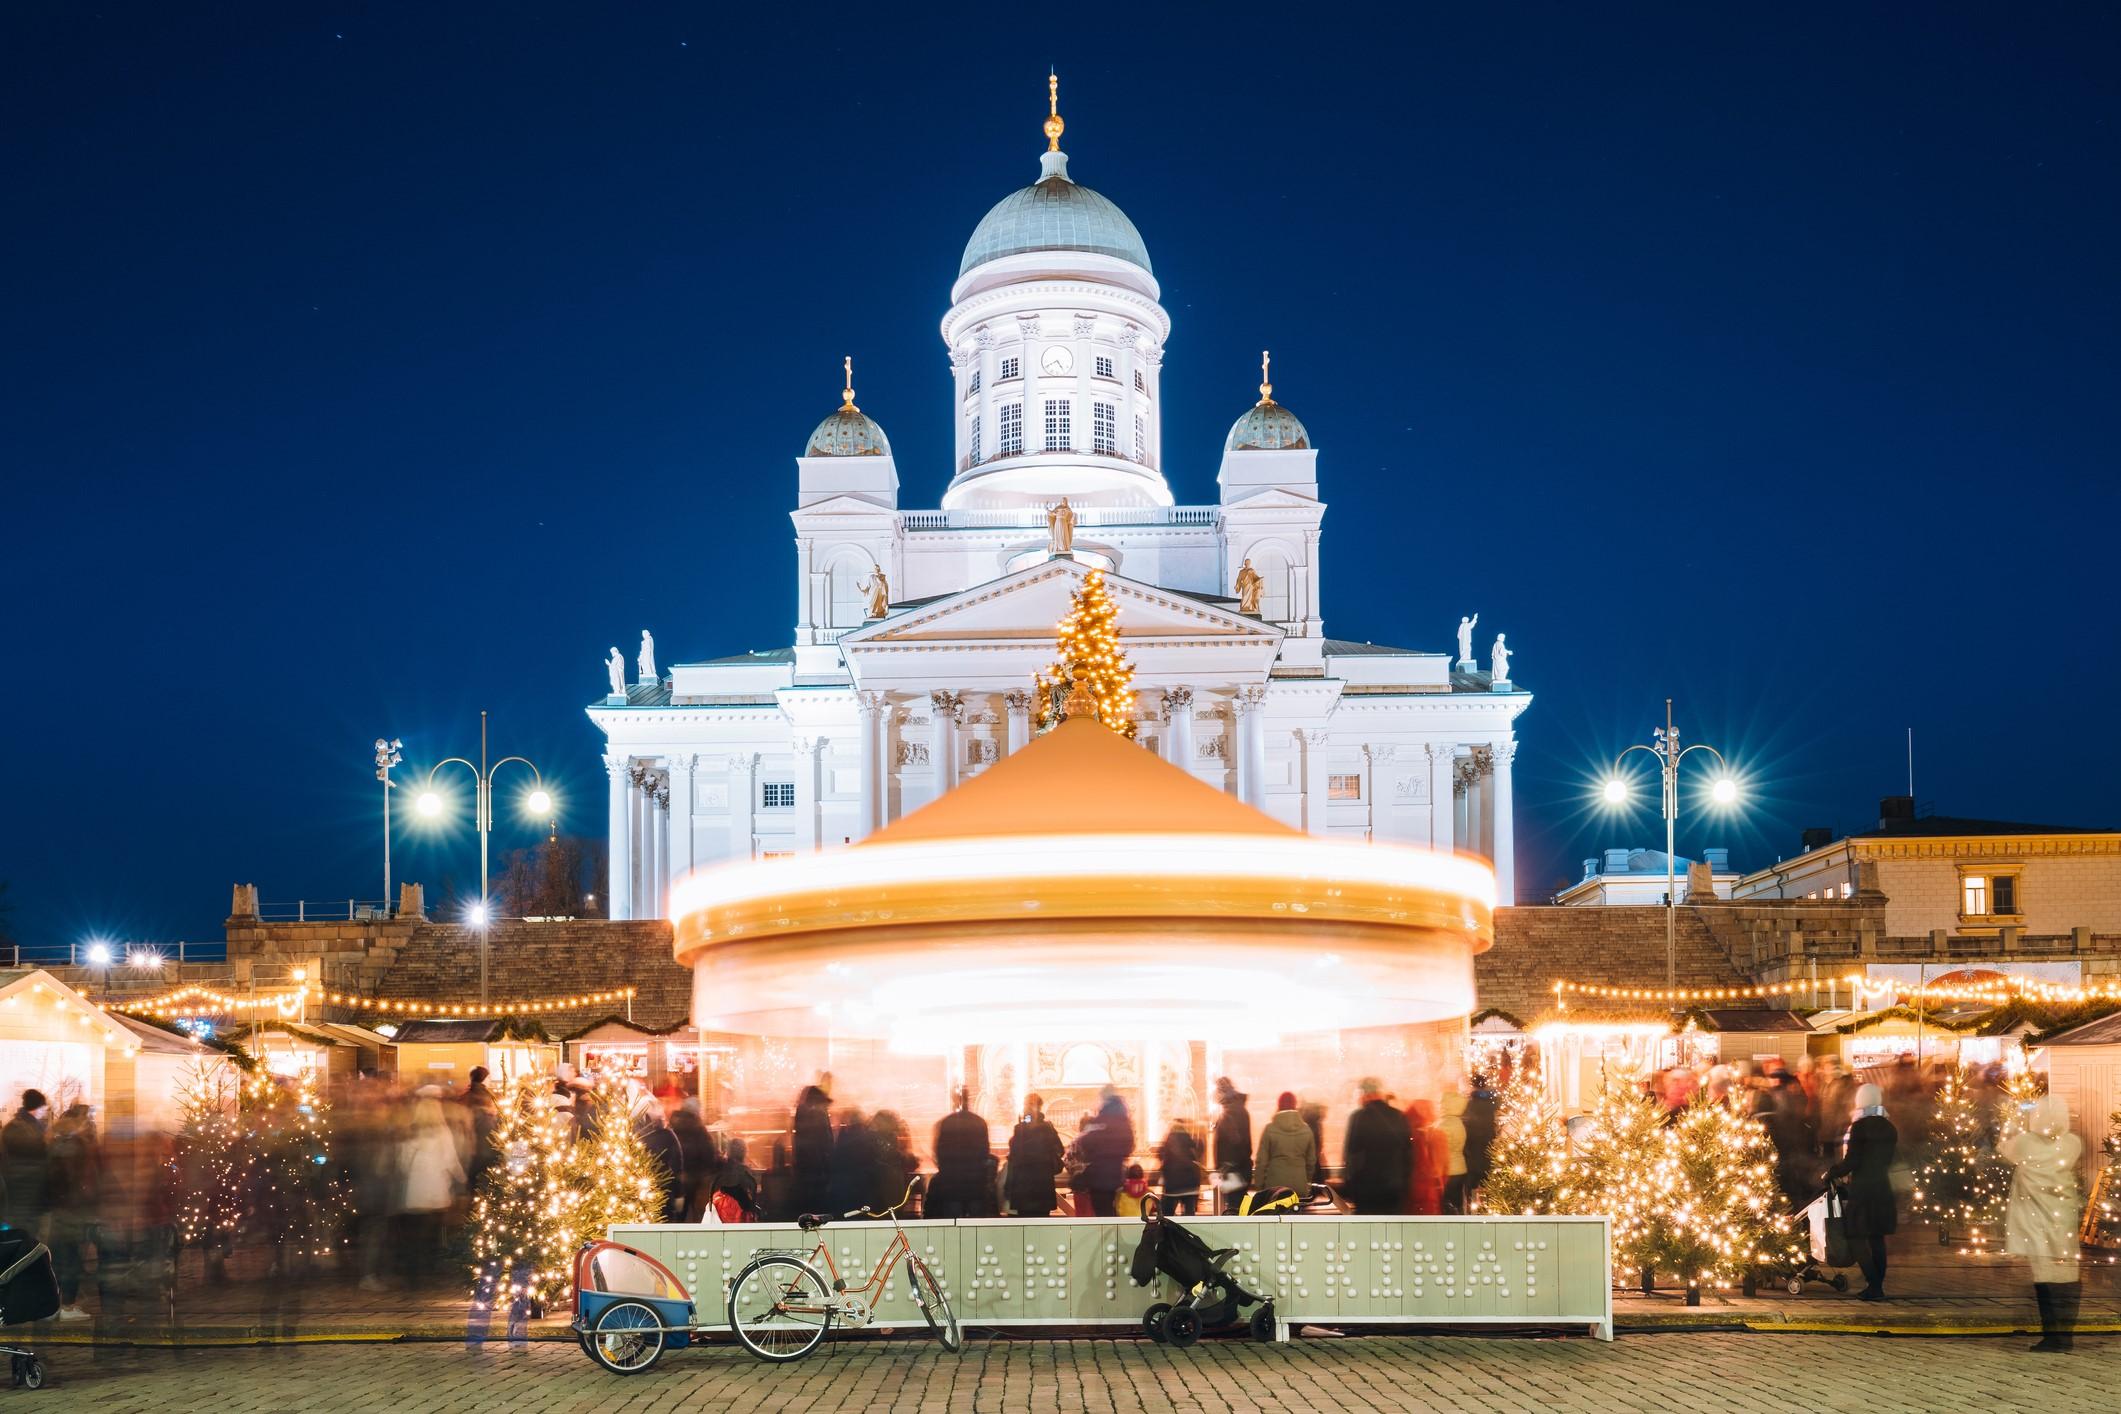 Helsinki Christmas Market